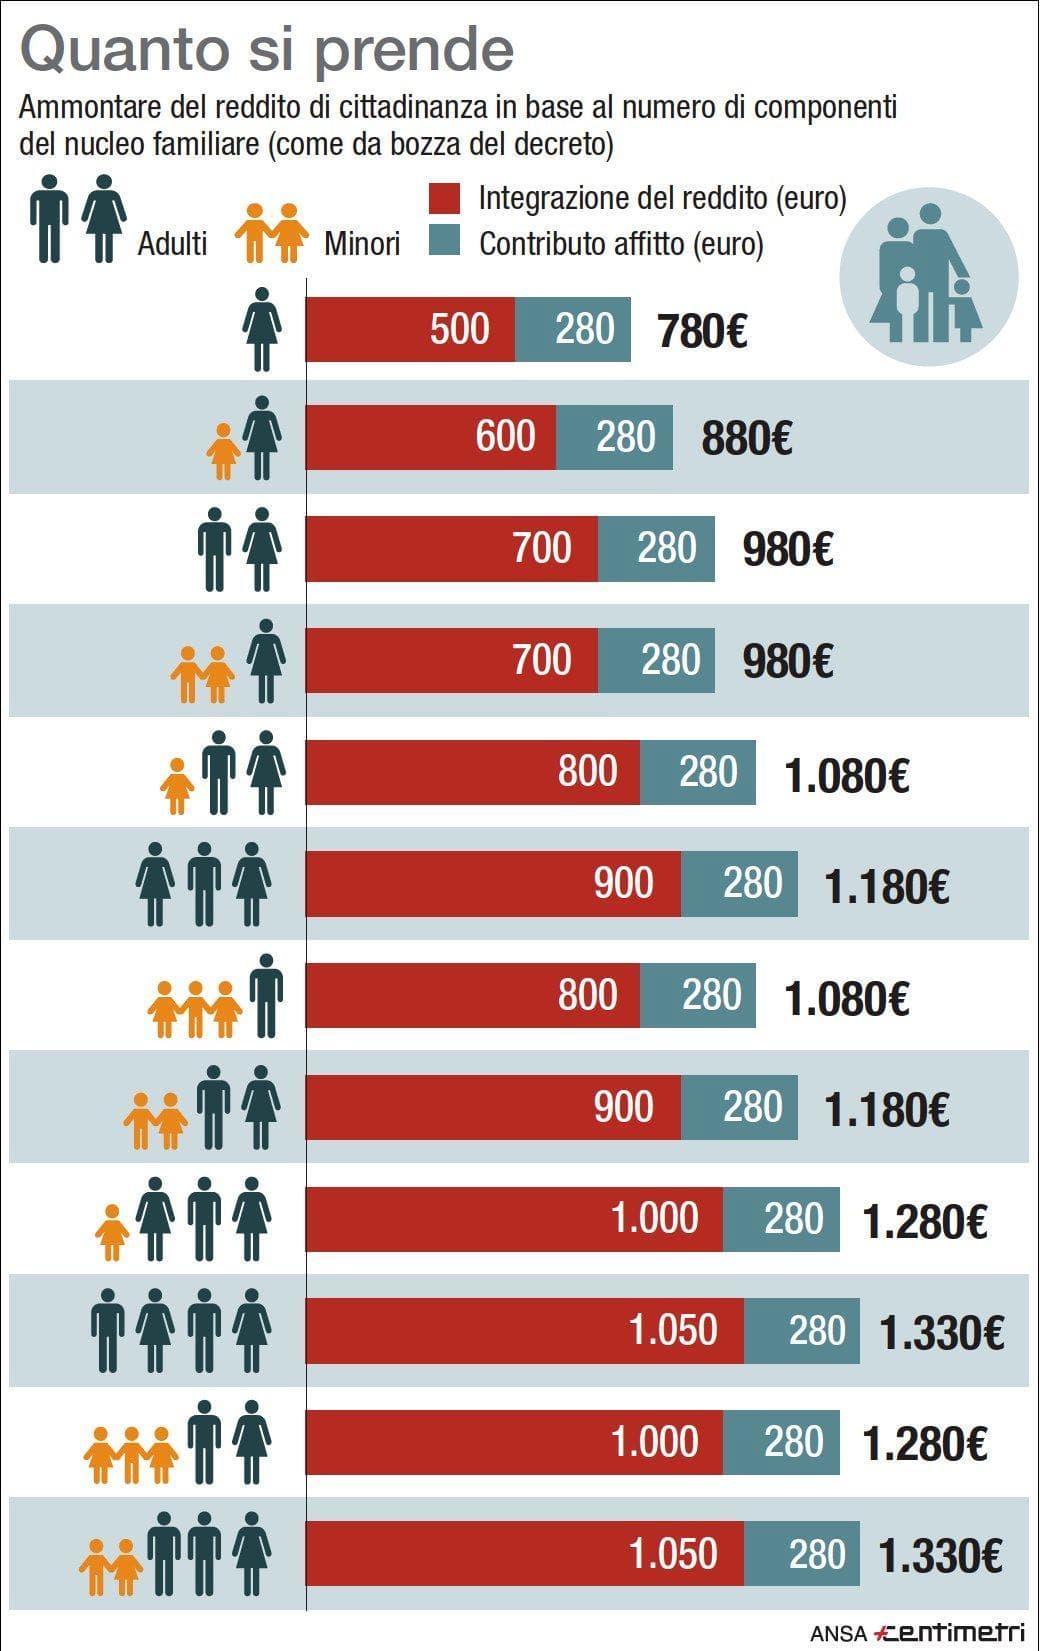 reddito cittadinanza infografica ansa-3